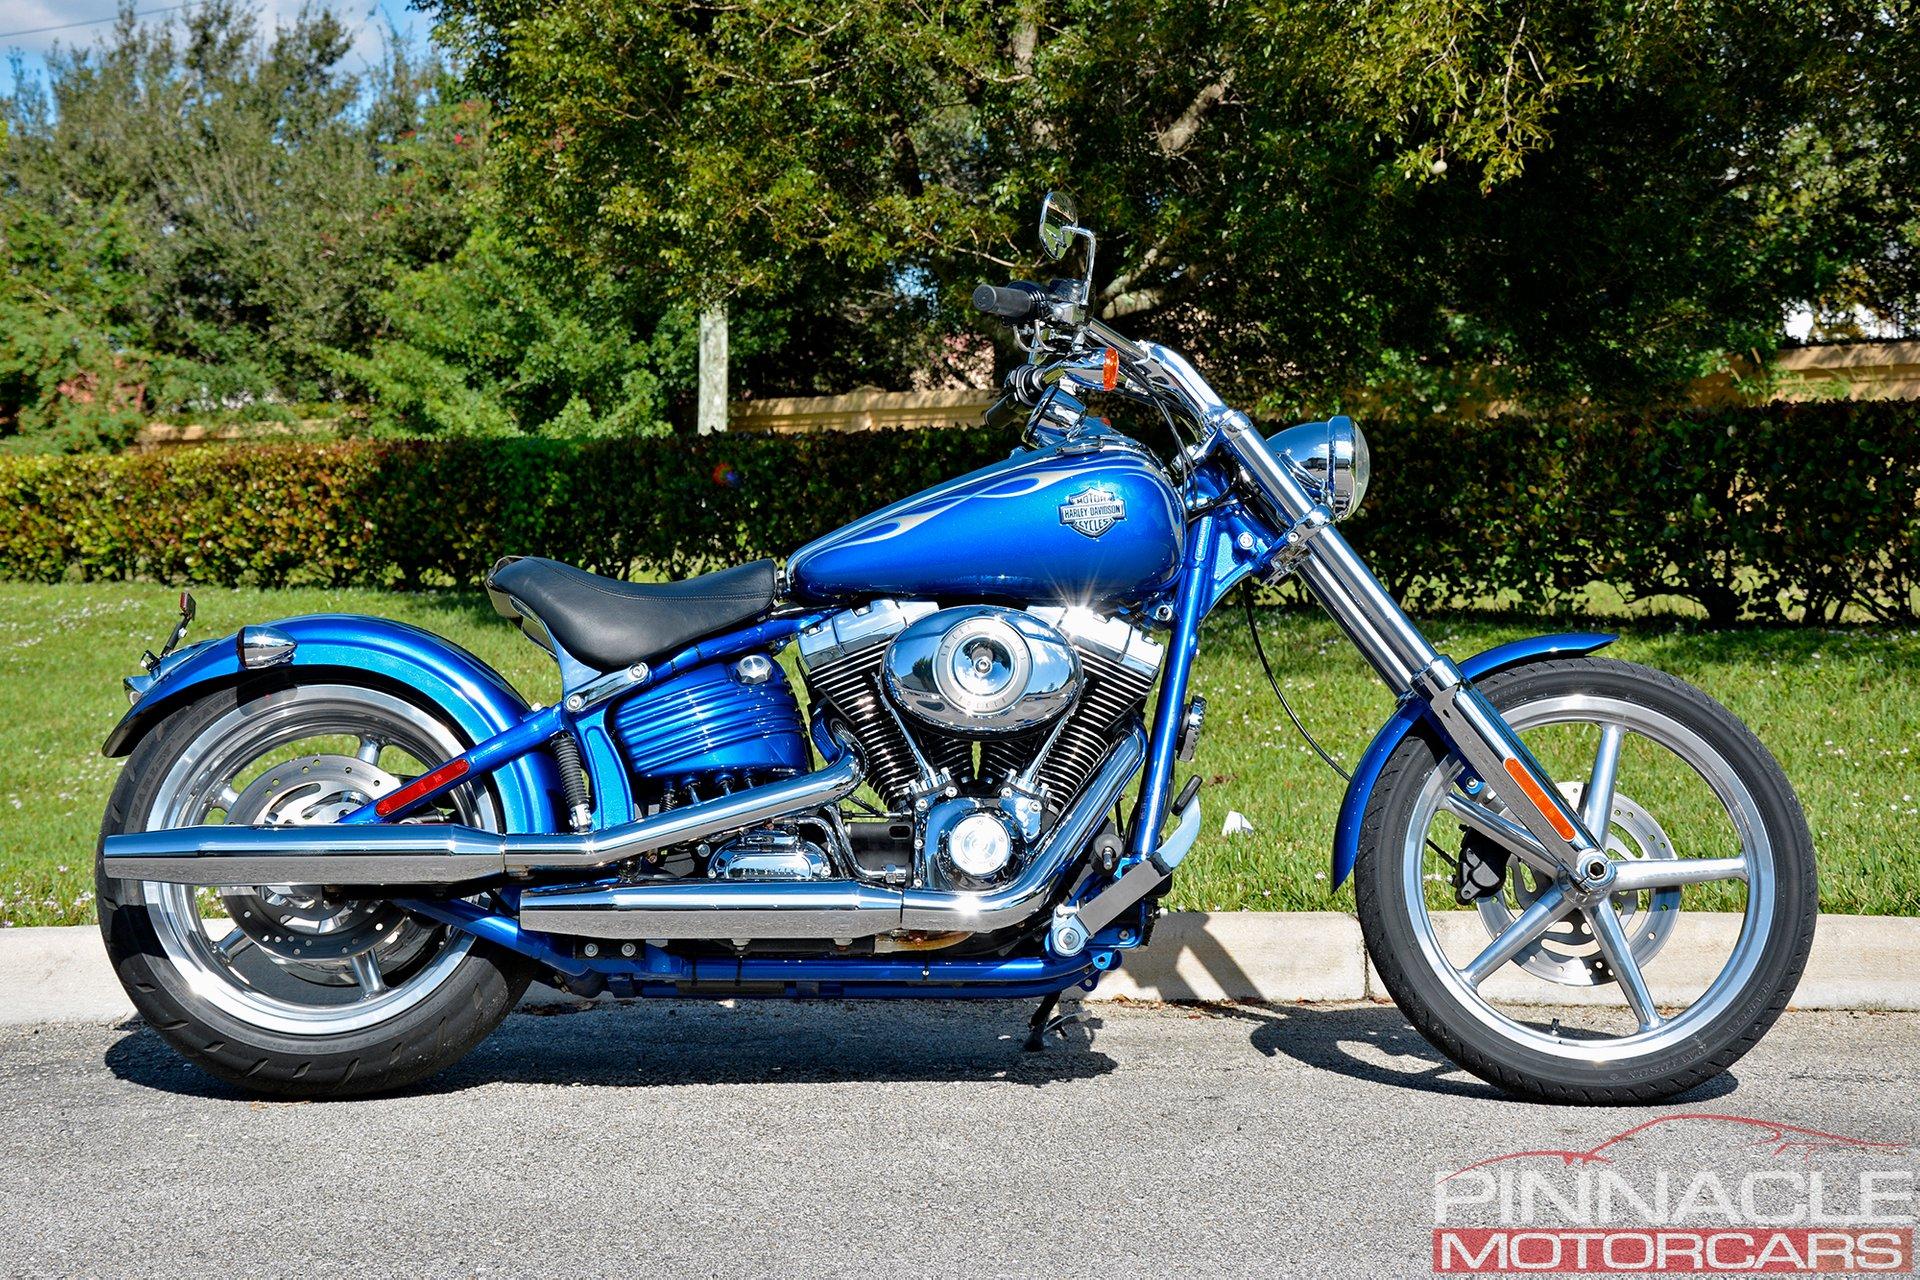 2009 Harley Davidson Softail Rocker C